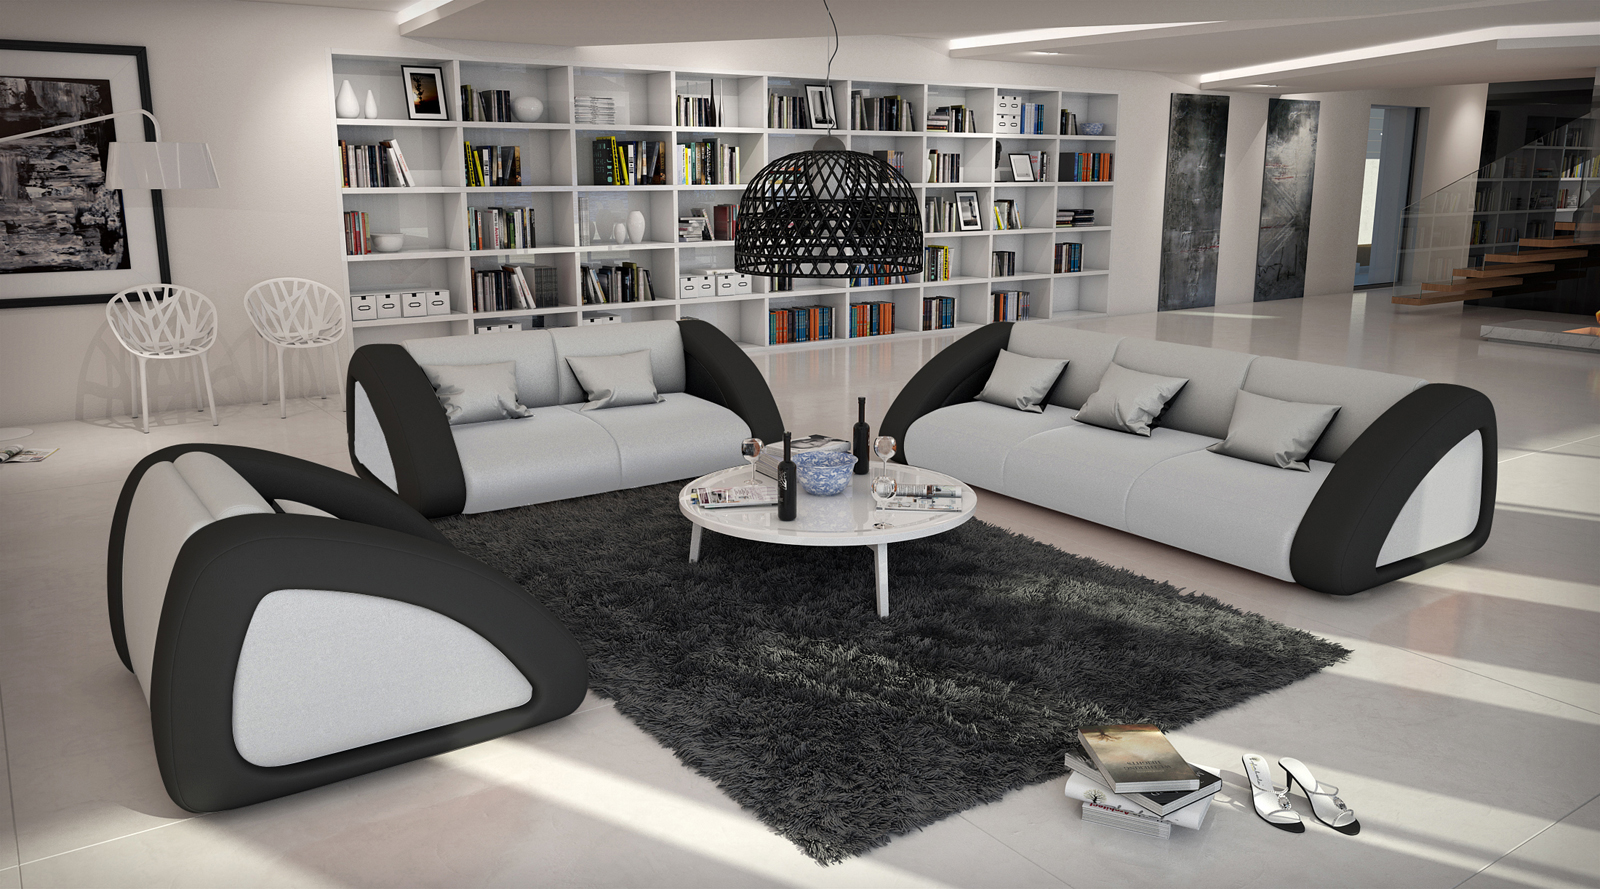 sam sofa garnitur wei wei schwarz ciao combi 3 2 1. Black Bedroom Furniture Sets. Home Design Ideas